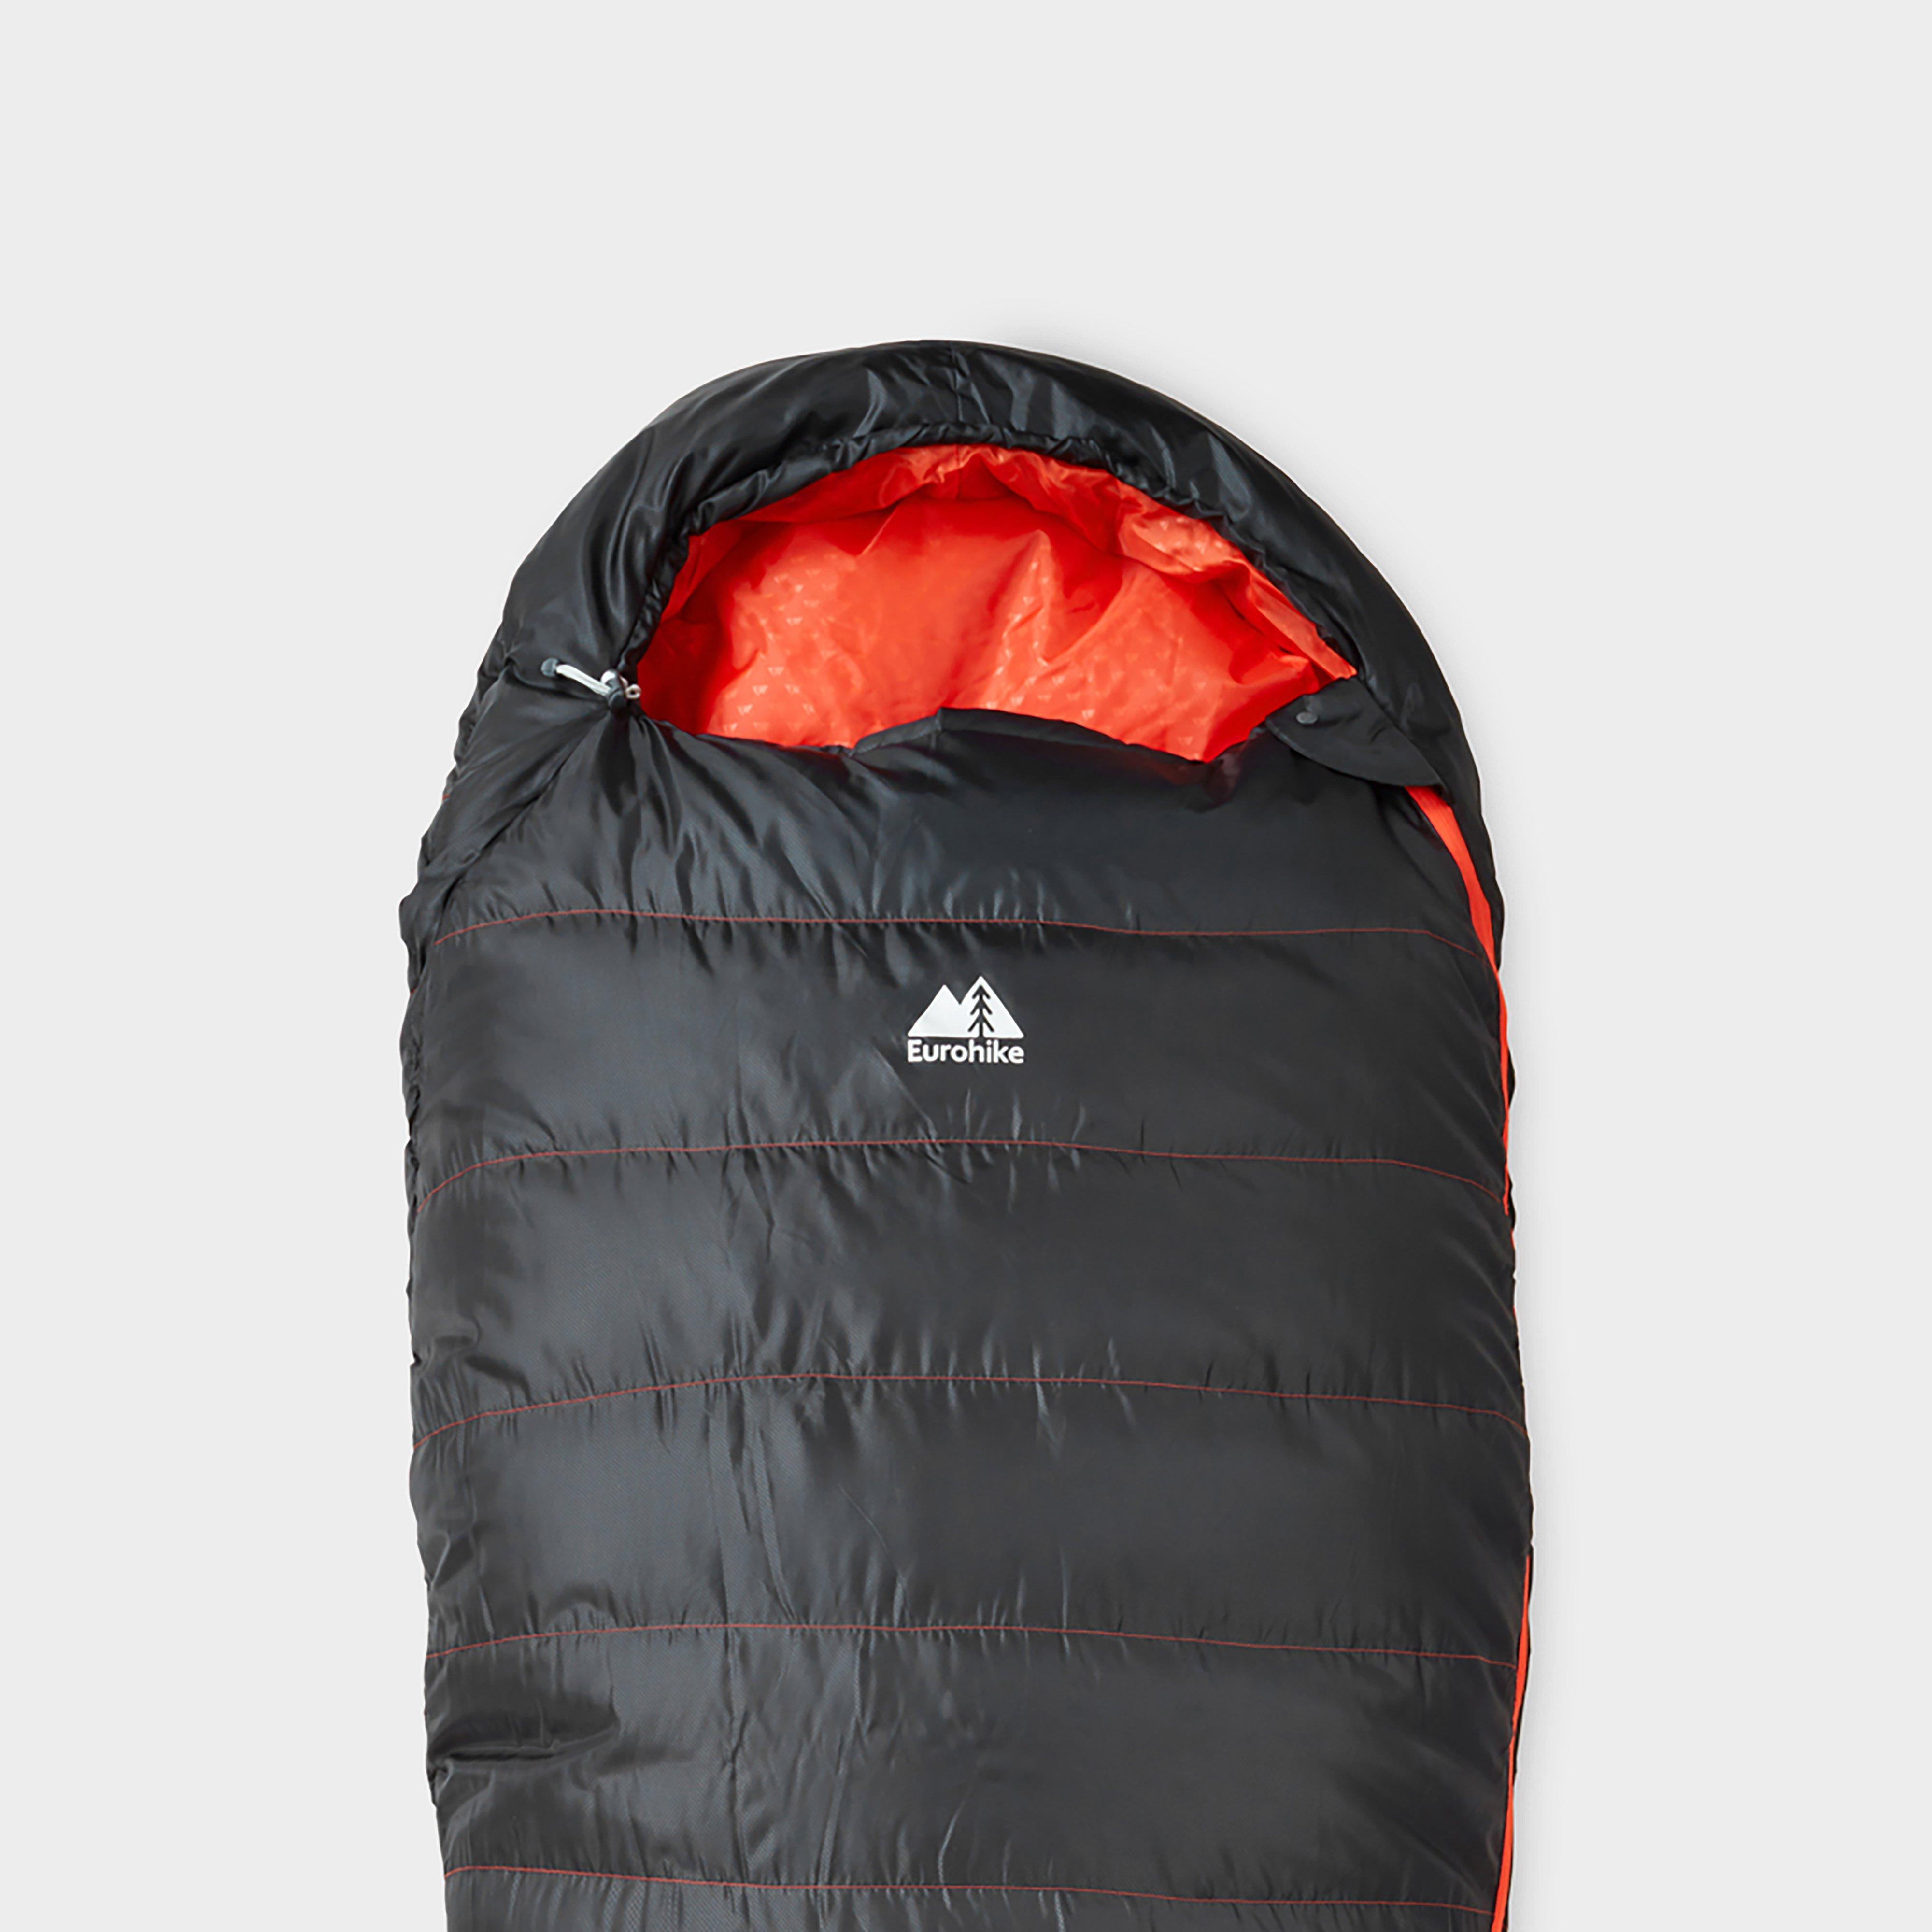 Eurohike Down Hybrid Sleeping Bag